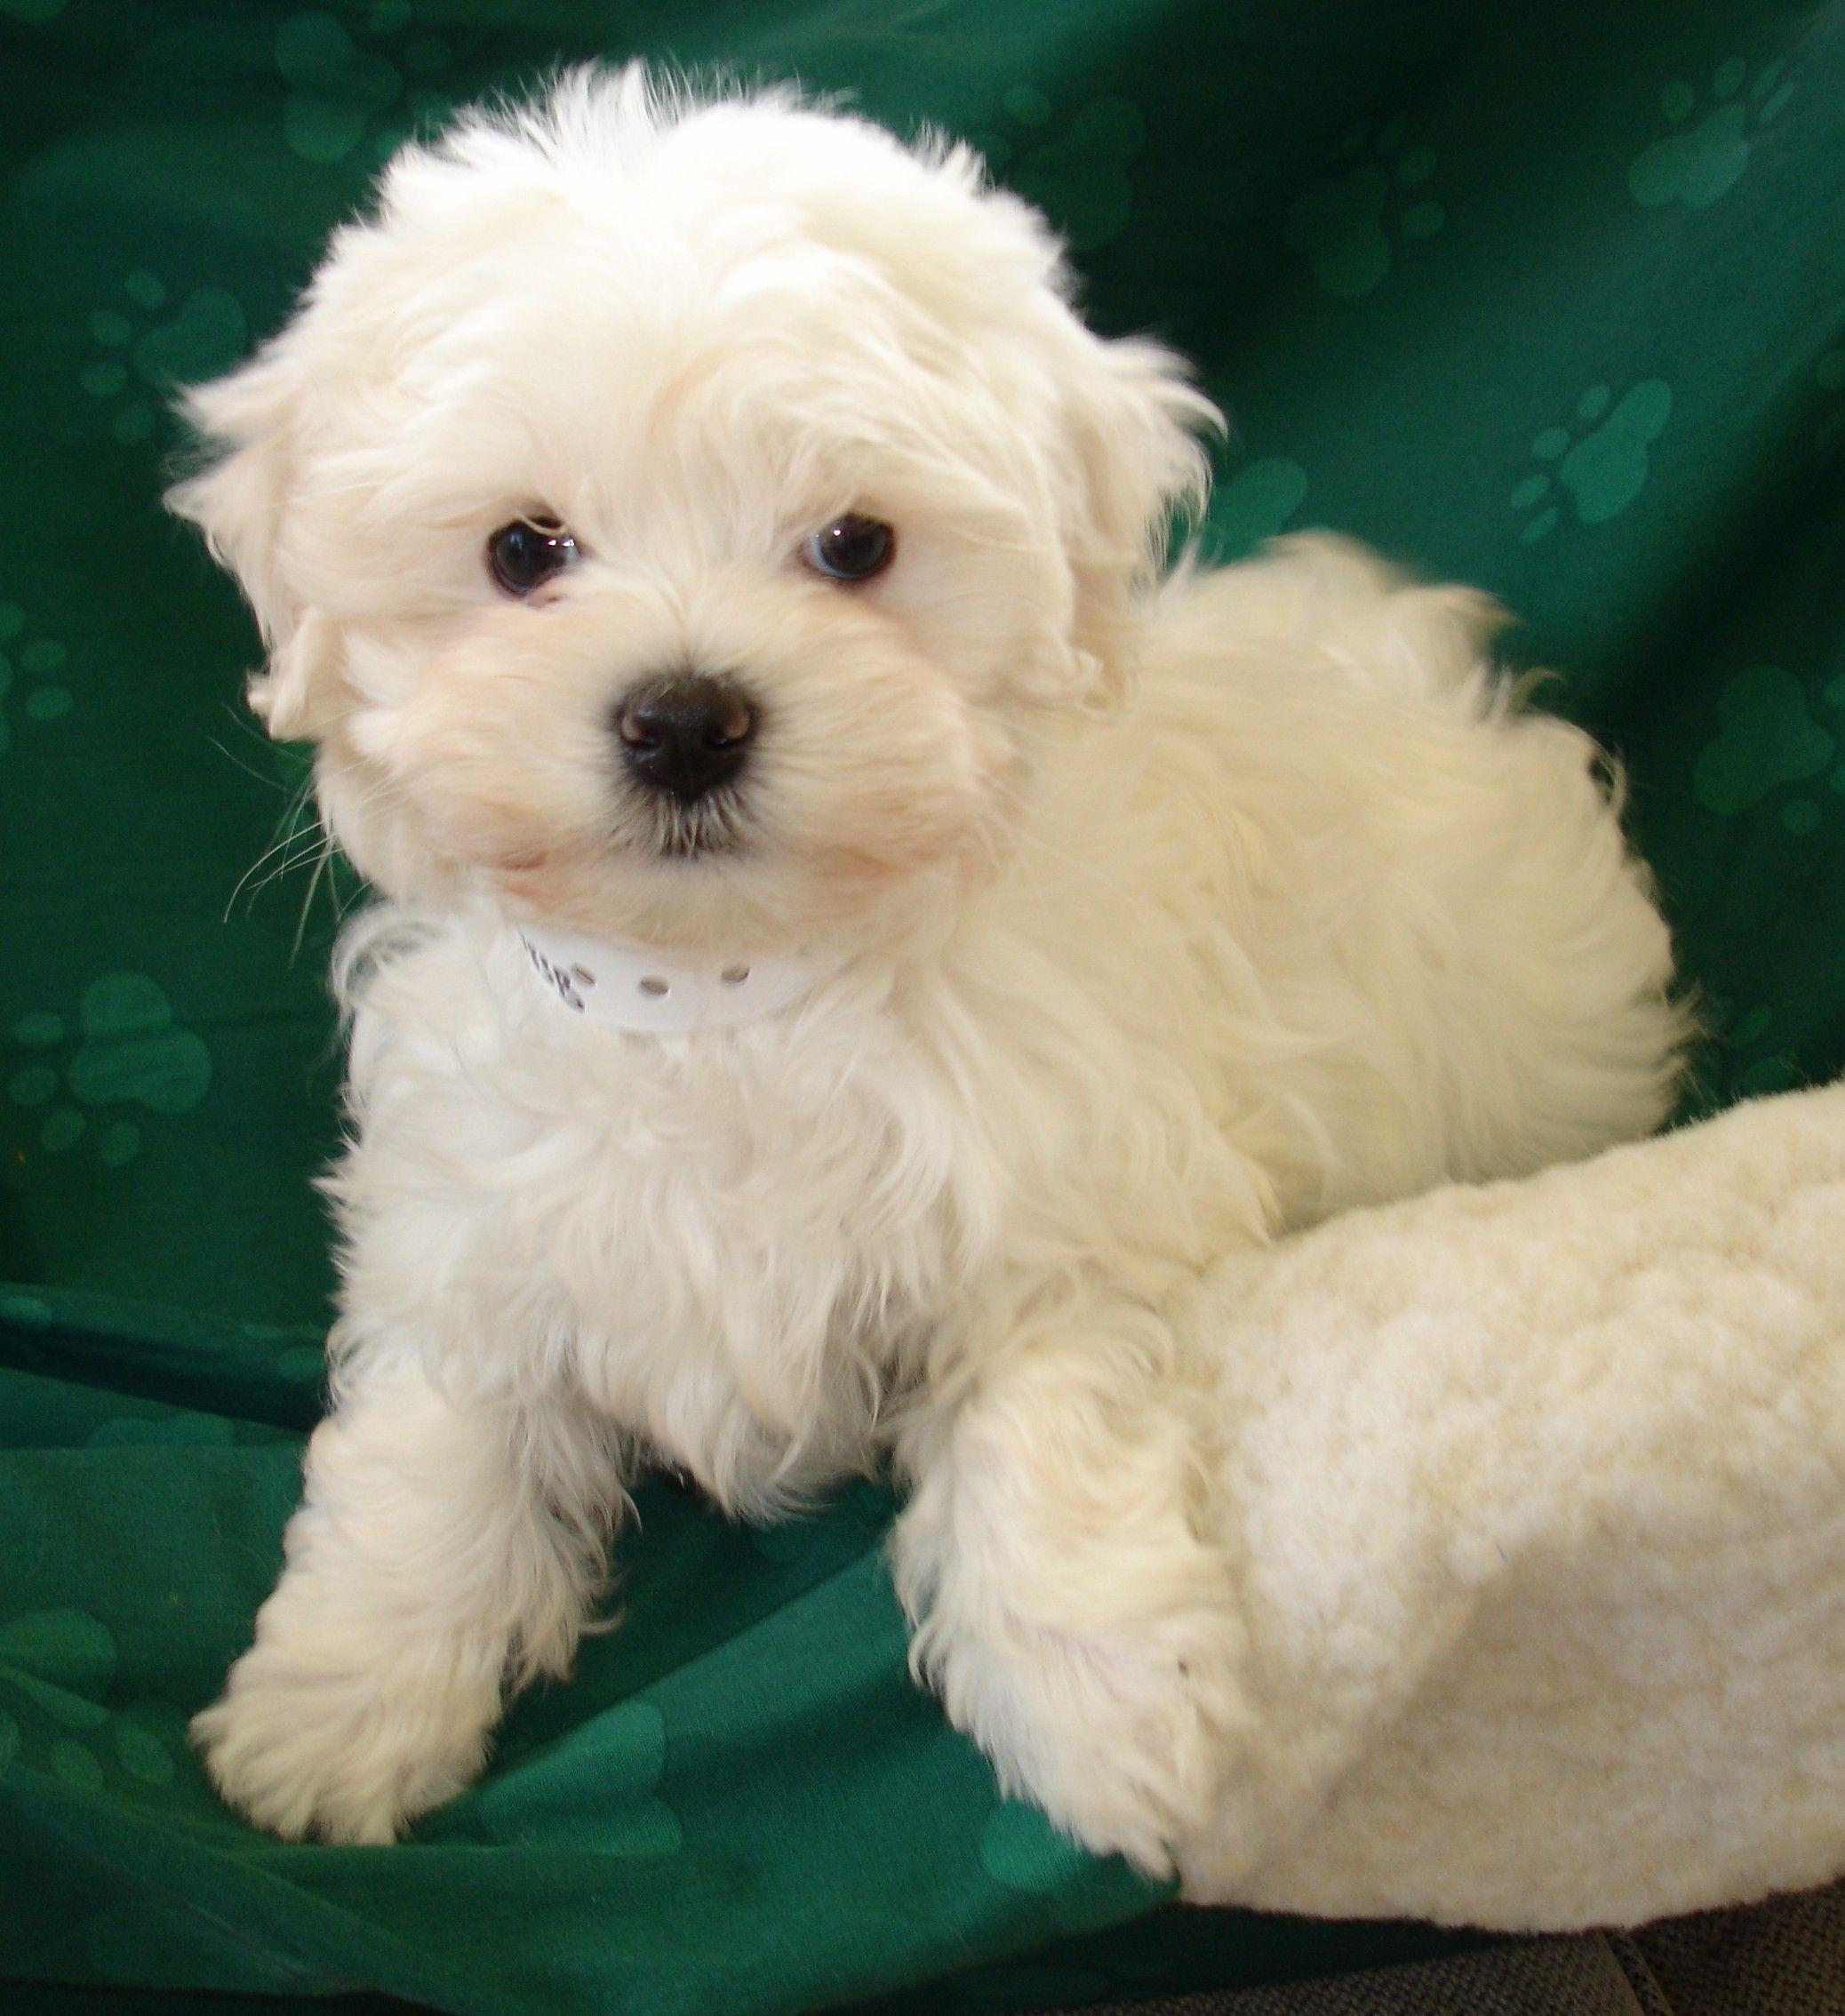 White Maltese Puppy For Sale Maltese Puppy Maltese Puppies For